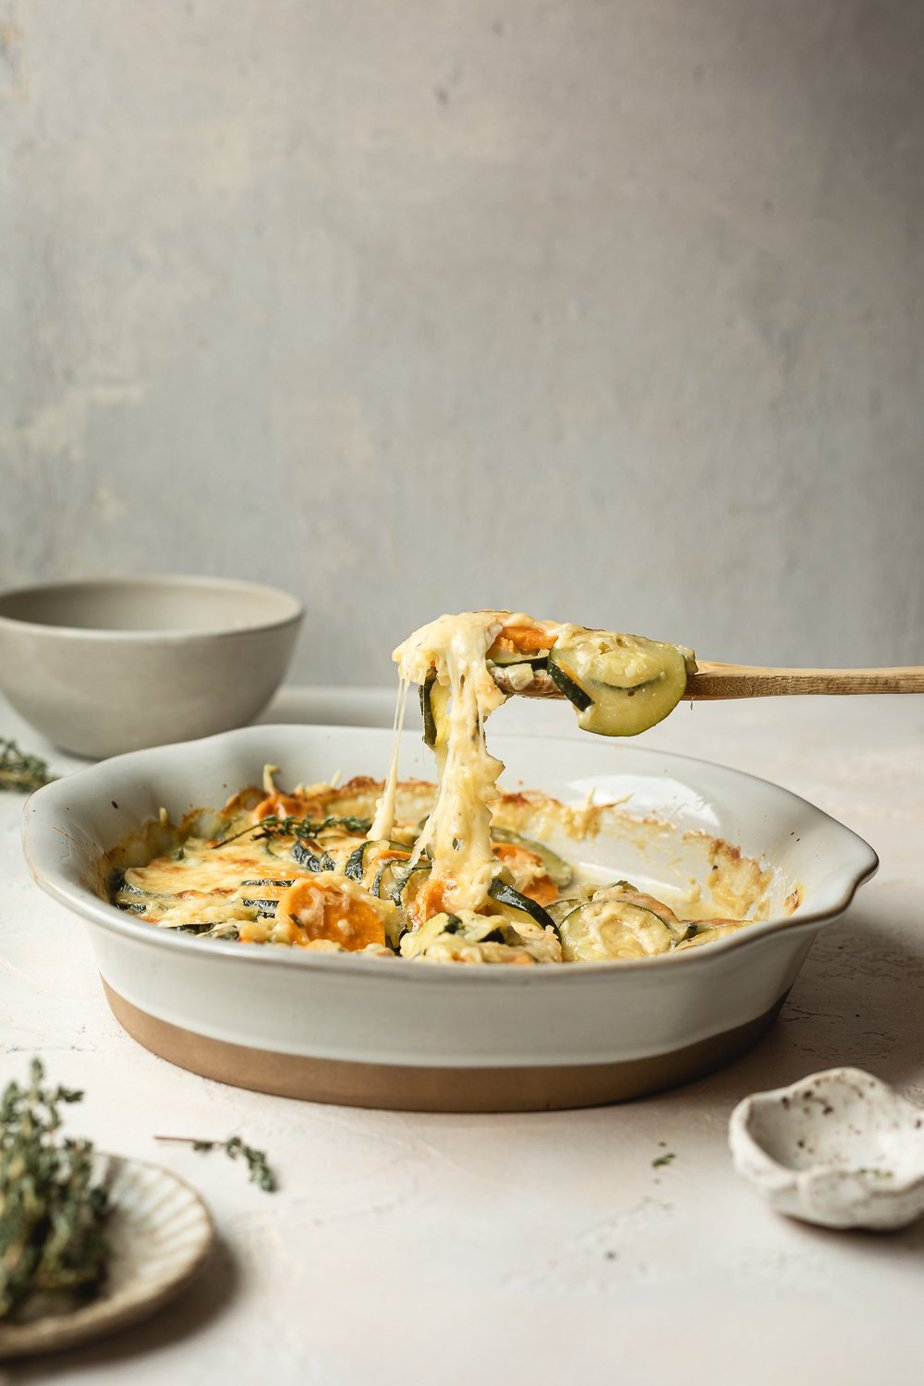 spoon pulling away a cheesy bite of zucchini gratin